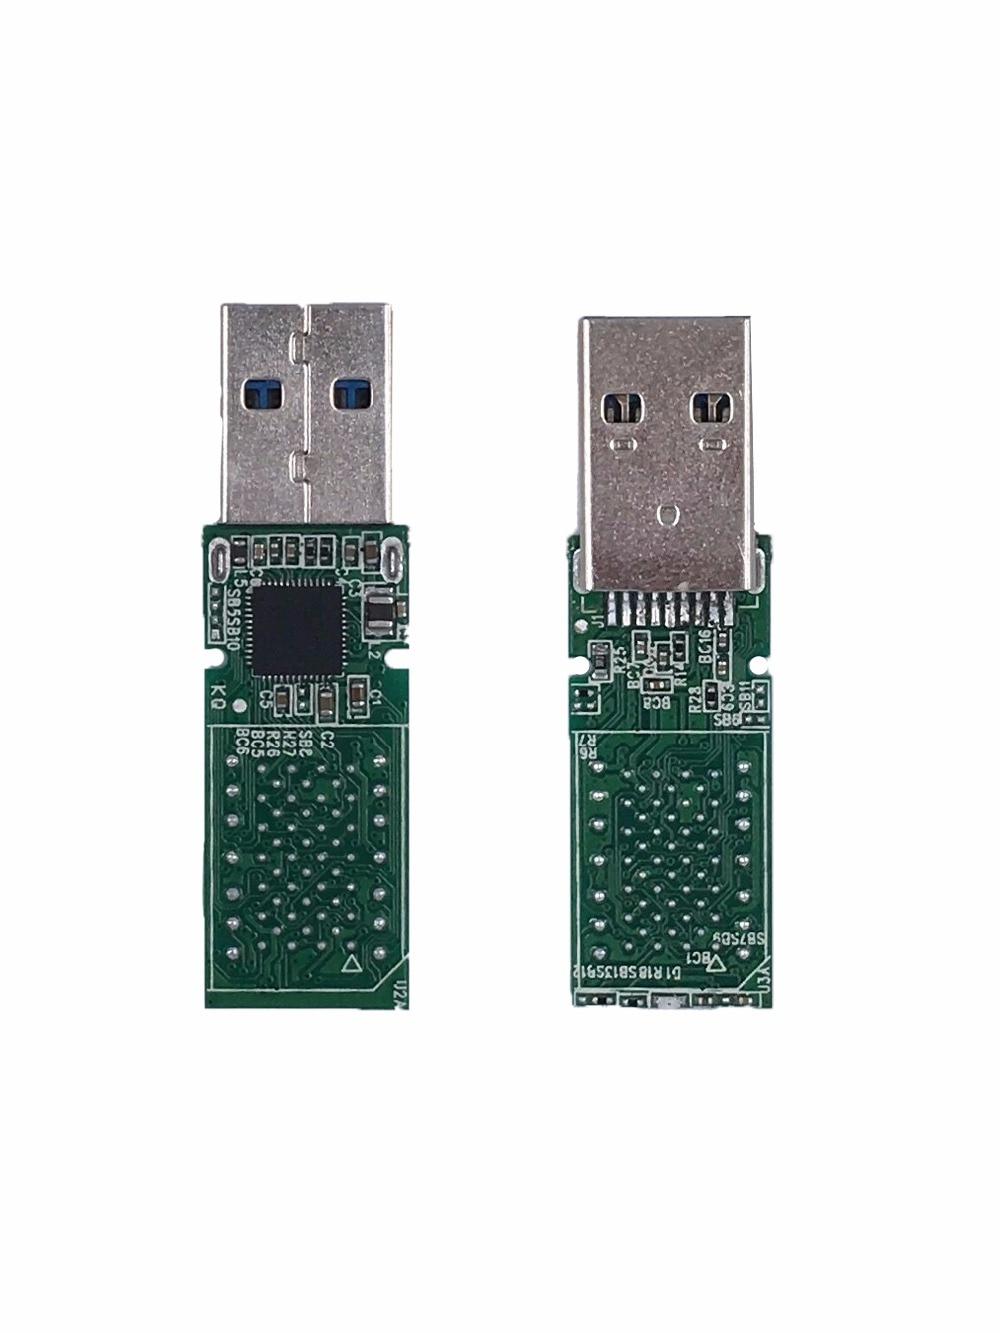 Pour iphone nand socket LGA60 SM3267 USB 3.0 carte PCB U disque libre cristal avec LGA double-pad E2NAND Hynix E NAND FLASHPour iphone nand socket LGA60 SM3267 USB 3.0 carte PCB U disque libre cristal avec LGA double-pad E2NAND Hynix E NAND FLASH